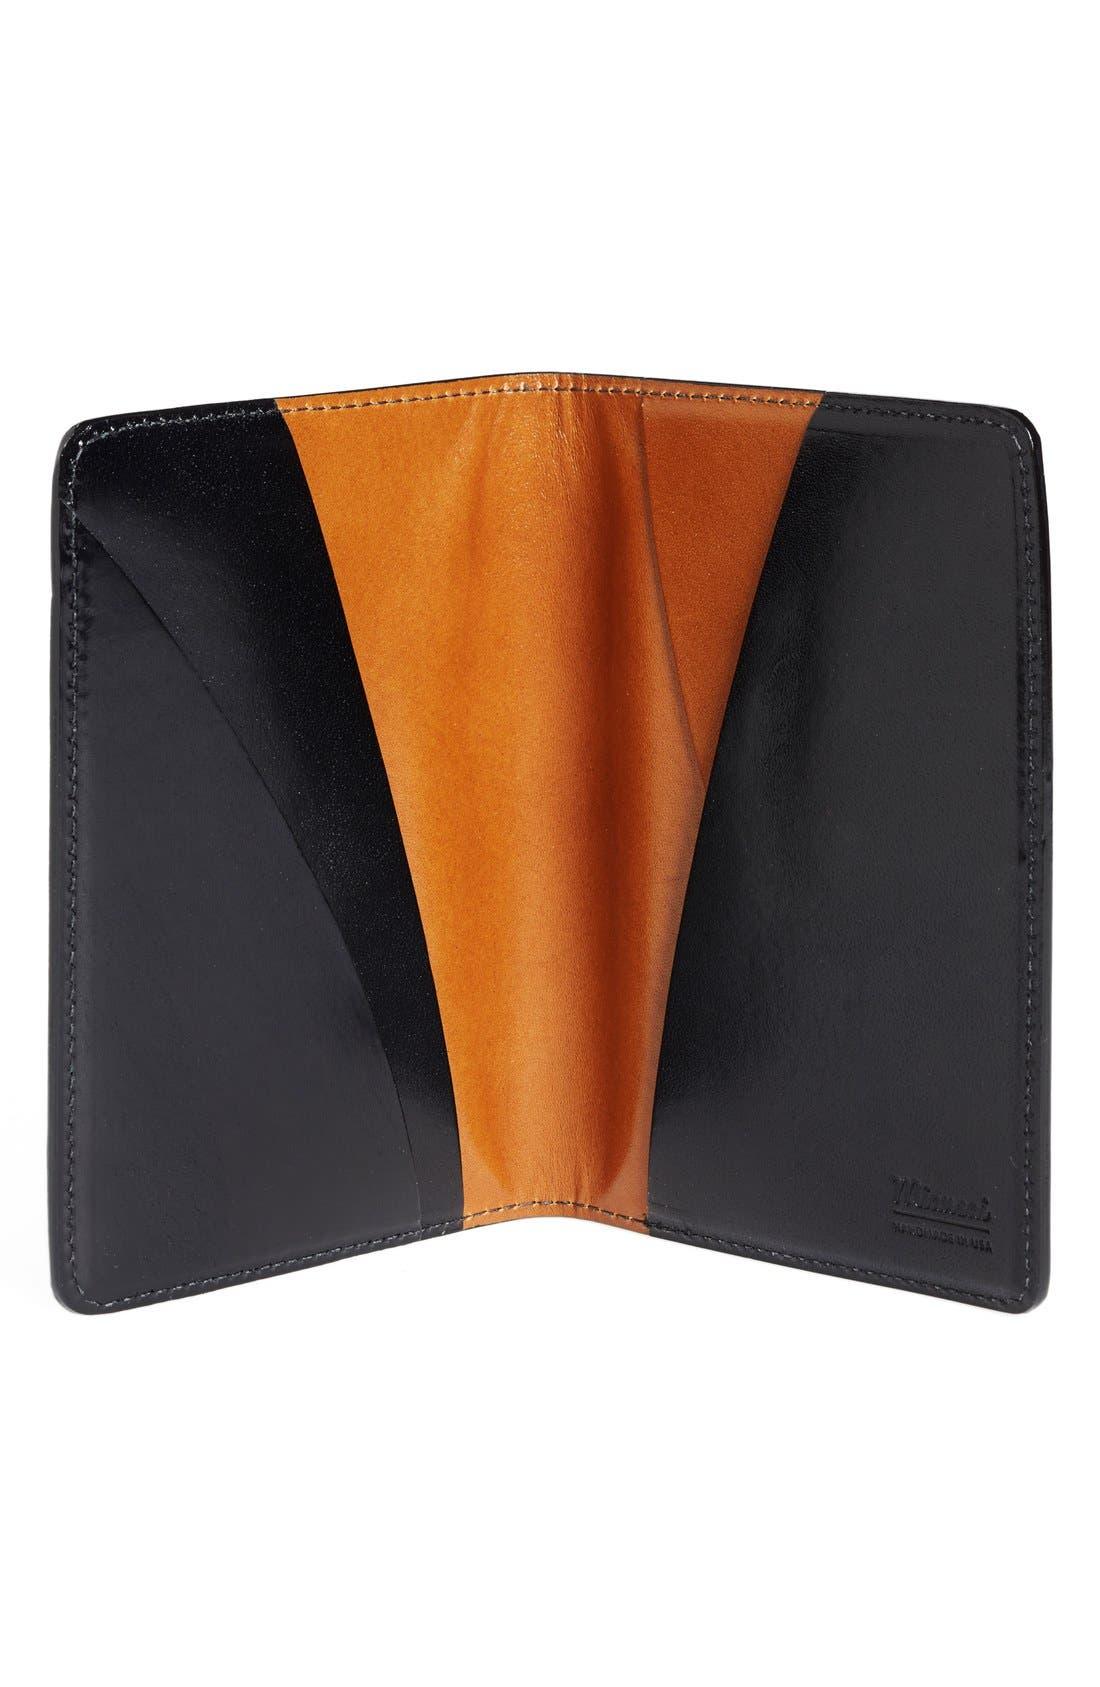 Leather Passport Wallet,                             Alternate thumbnail 3, color,                             005